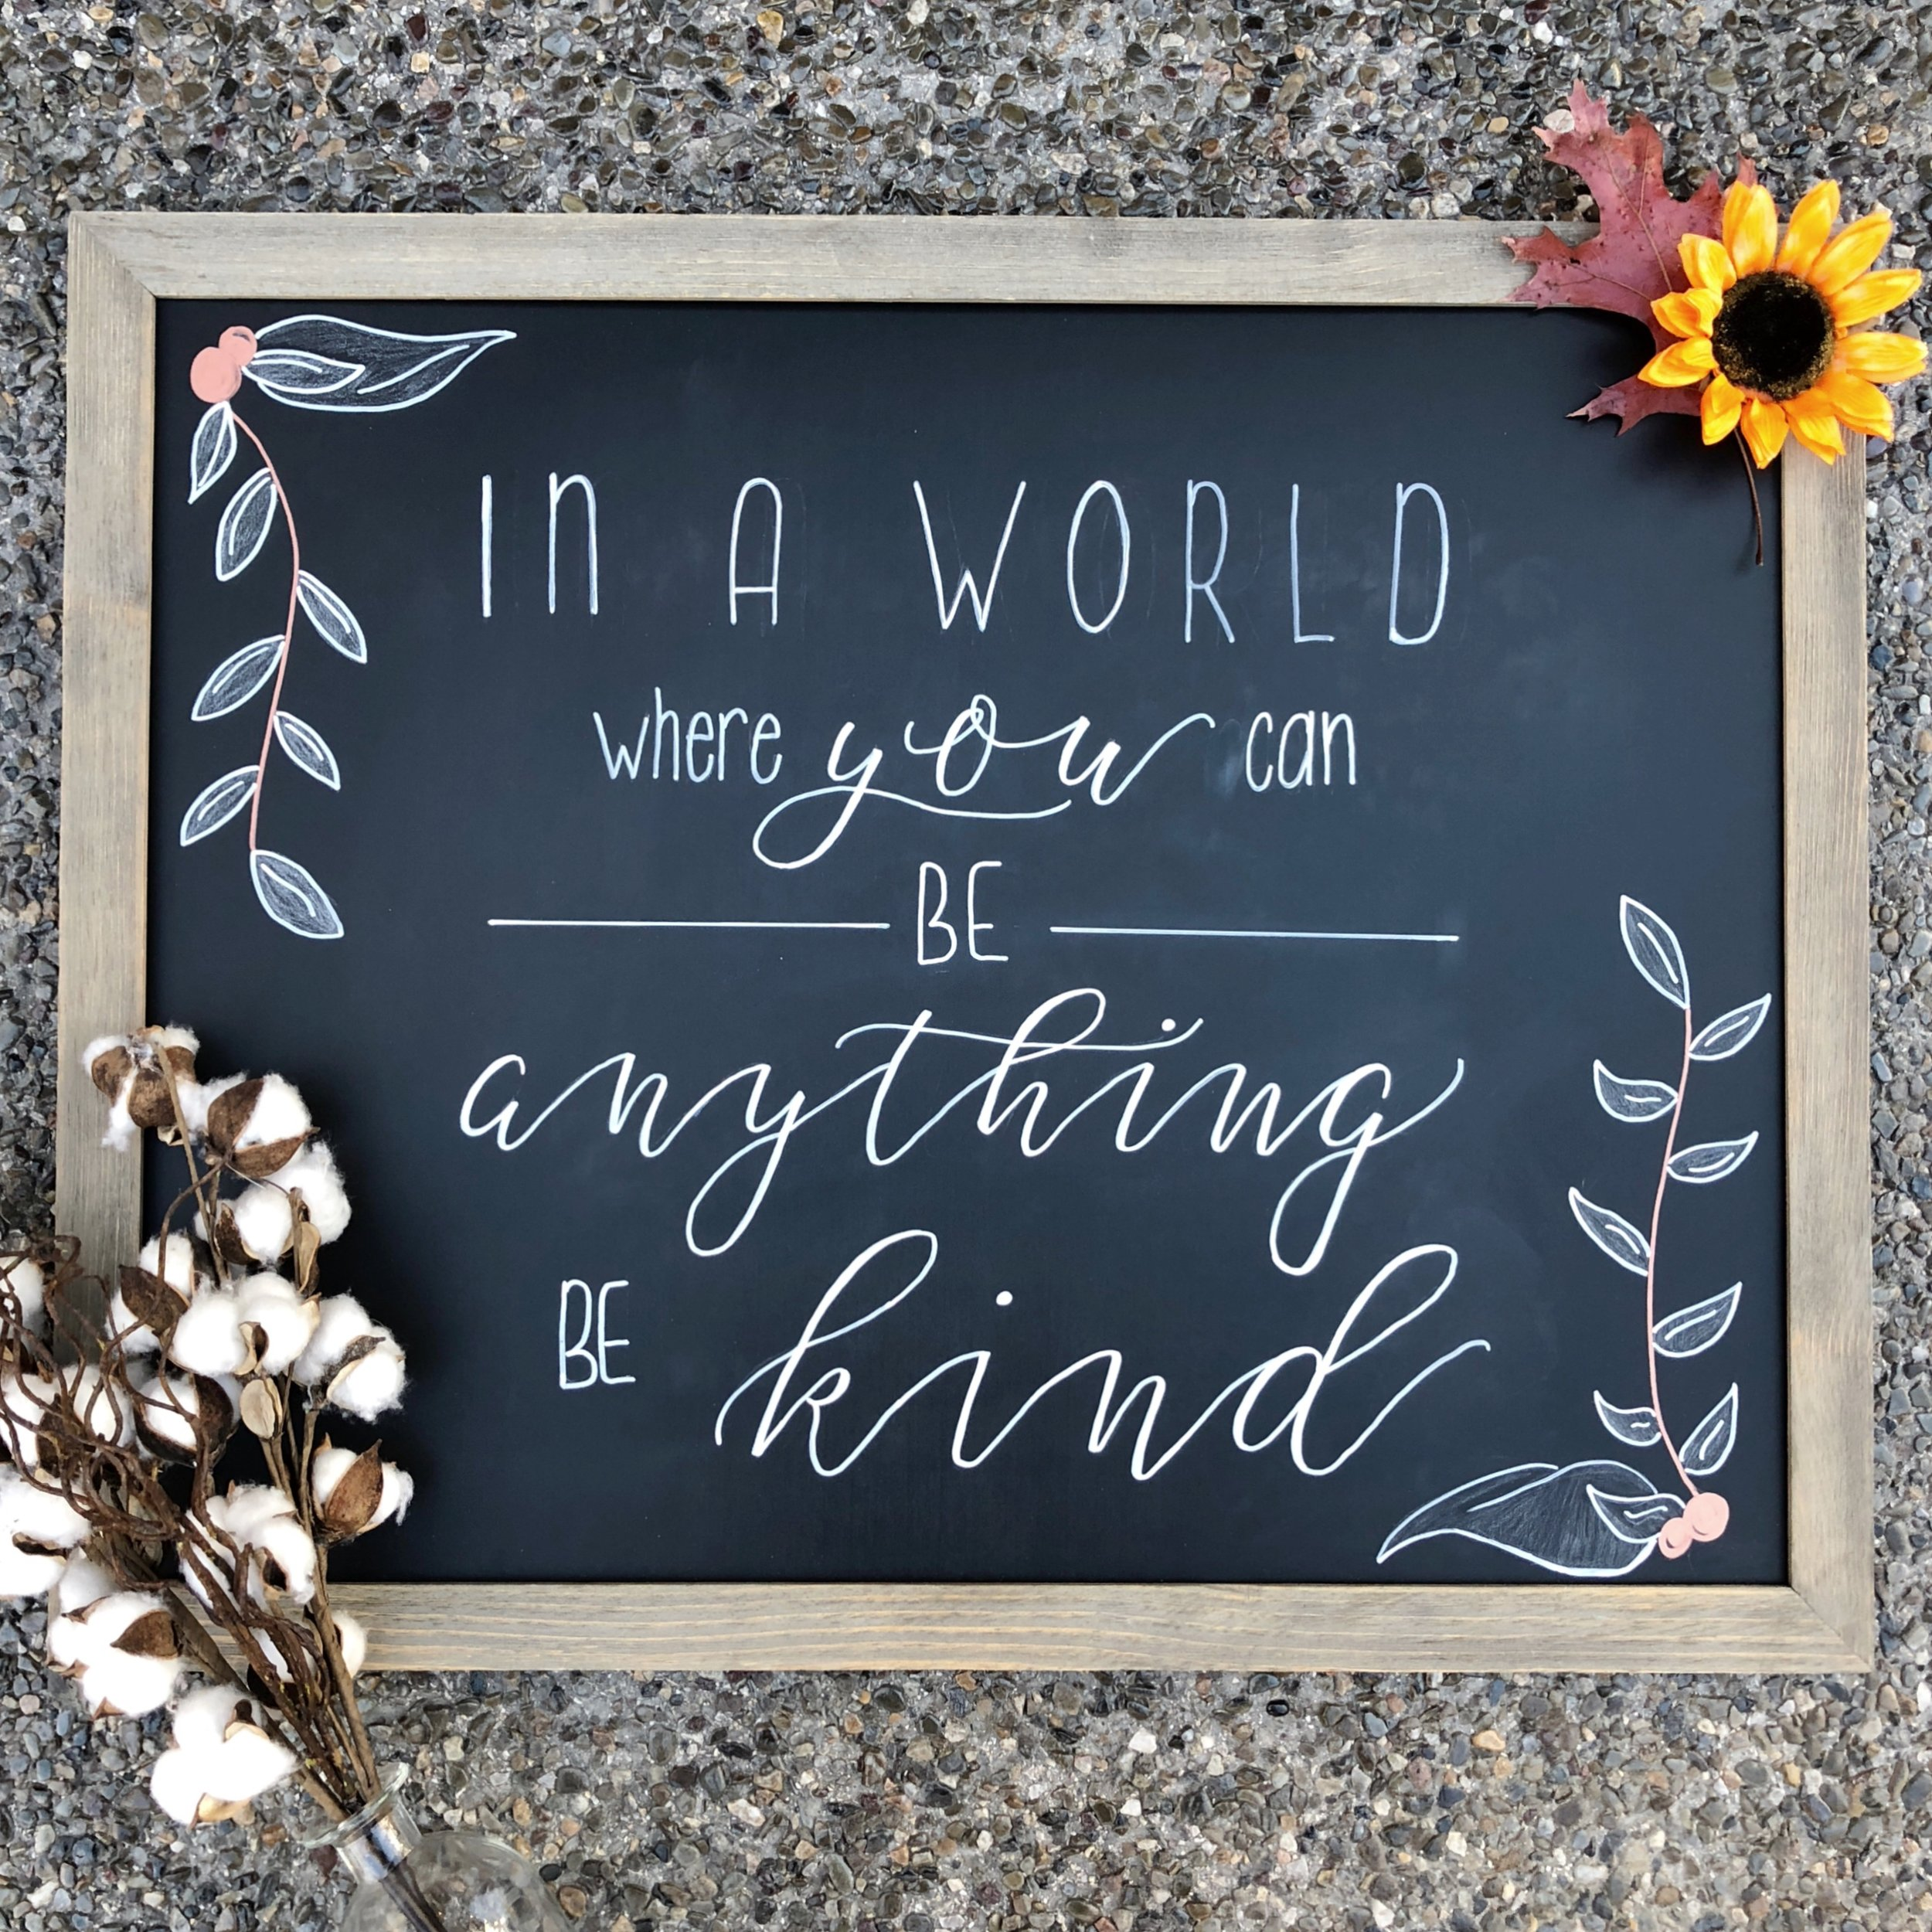 Central PA, York PA, JesSmith Designs, custom, wedding, invitations, bridal, announcements, save the date, birth, baby, motherhood, hanover, calligraphy, handlettering, wedding invitations, lancaster, gettysburg-11-22 16.01.54.jpg